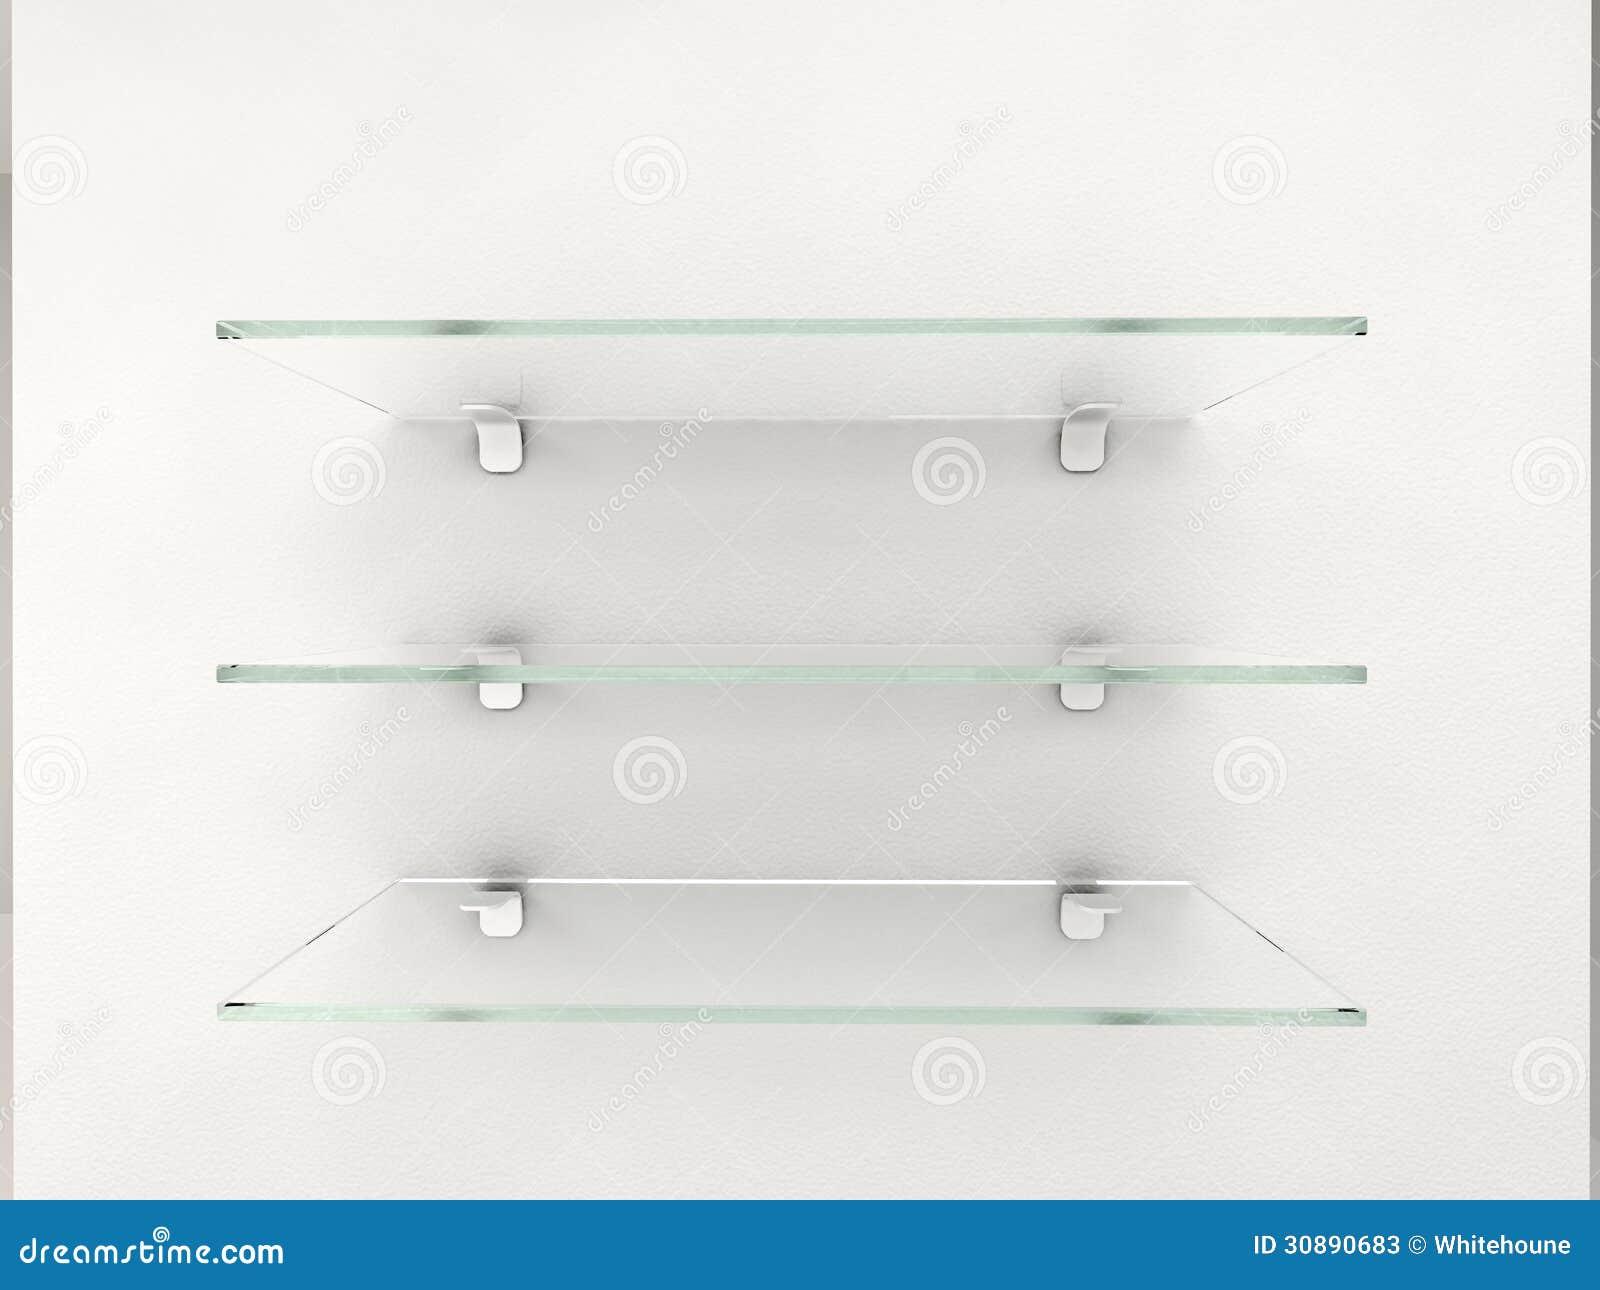 Glass Shelves Stock Photos - Image: 30890683